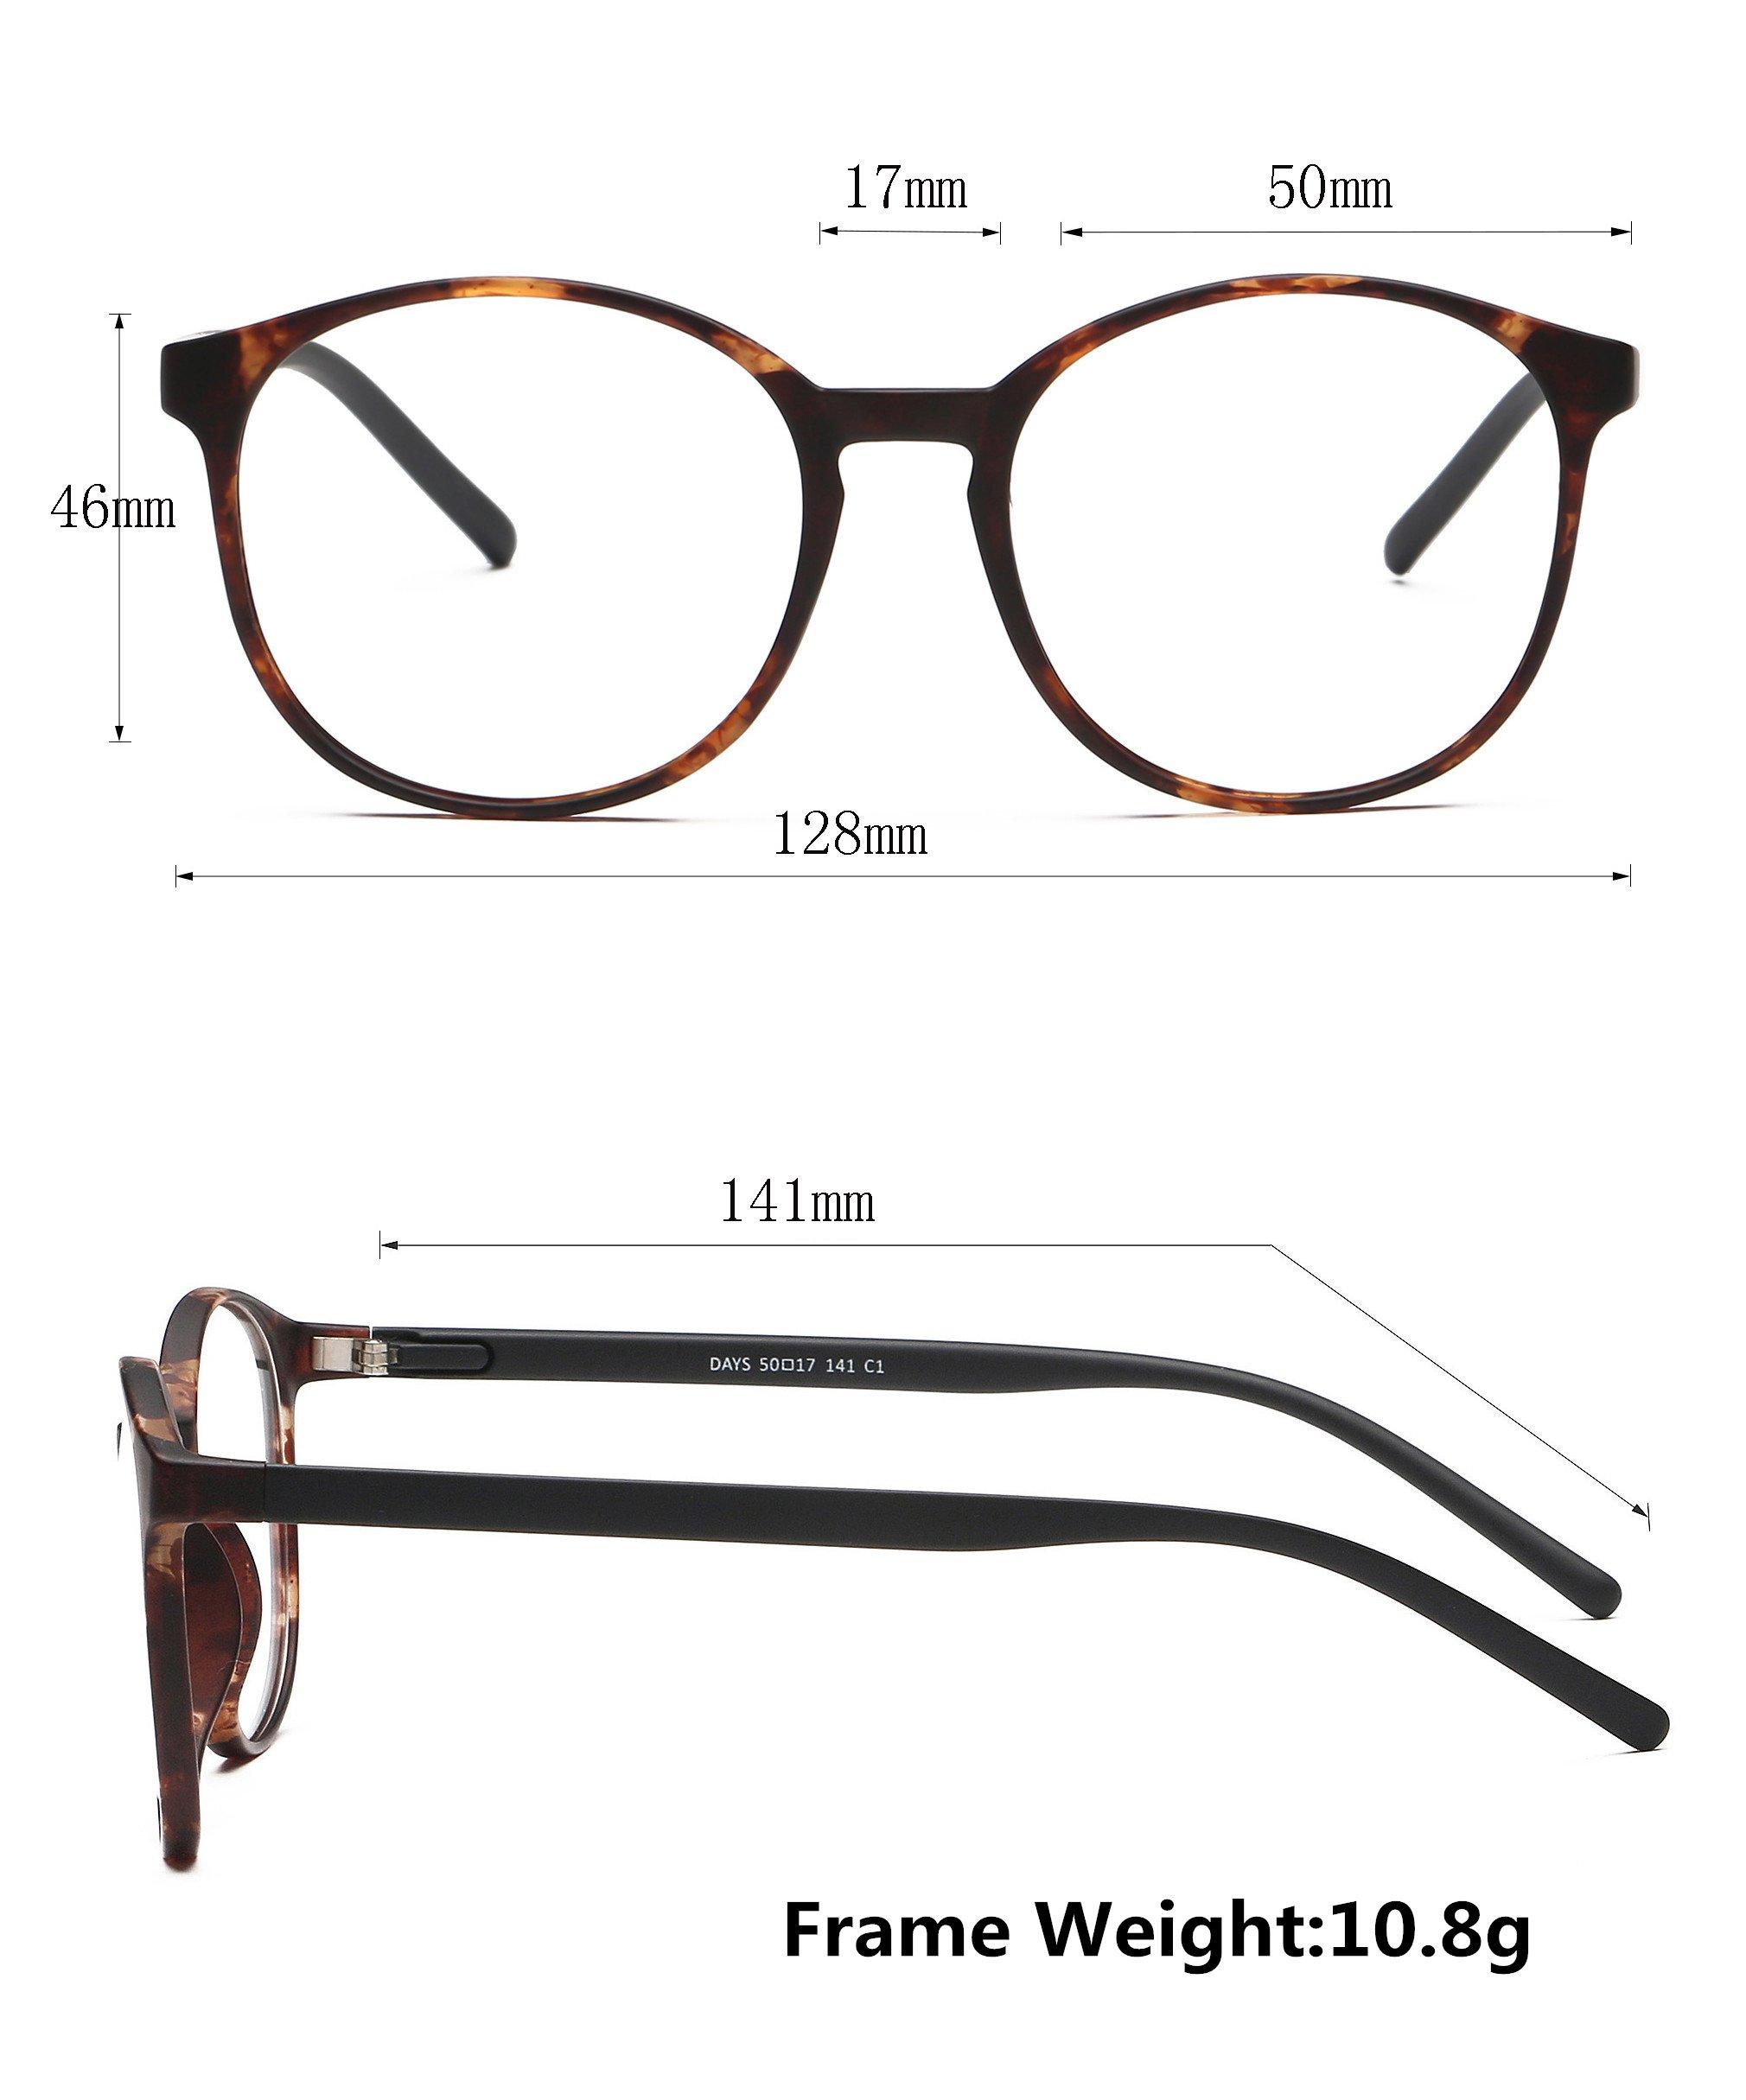 LifeArt Blue Light Blocking Glasses,Cut UV400 Transparent Lens,Computer Reading Glasses,Anti Eyestrain/Anti Scratch/Anti Smudgy,Sleep Better for Women/Men(LA_Days_Tortoise,0.00,No Magnification) by LifeArt (Image #3)